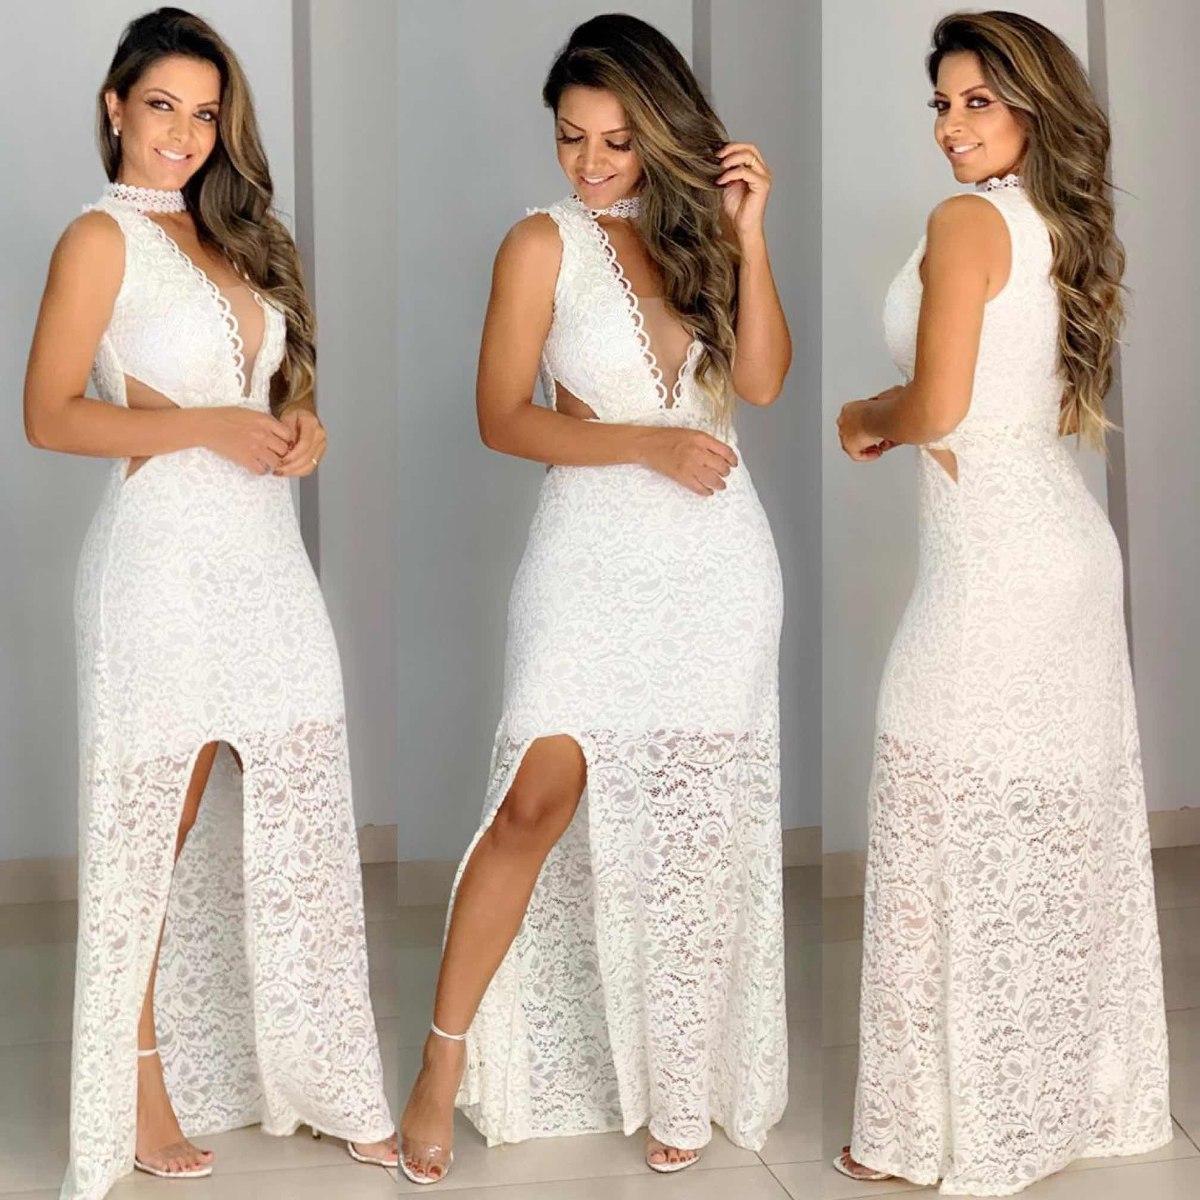 Vestido Branco Longo De Renda Tule Réveillon Virada Noiva